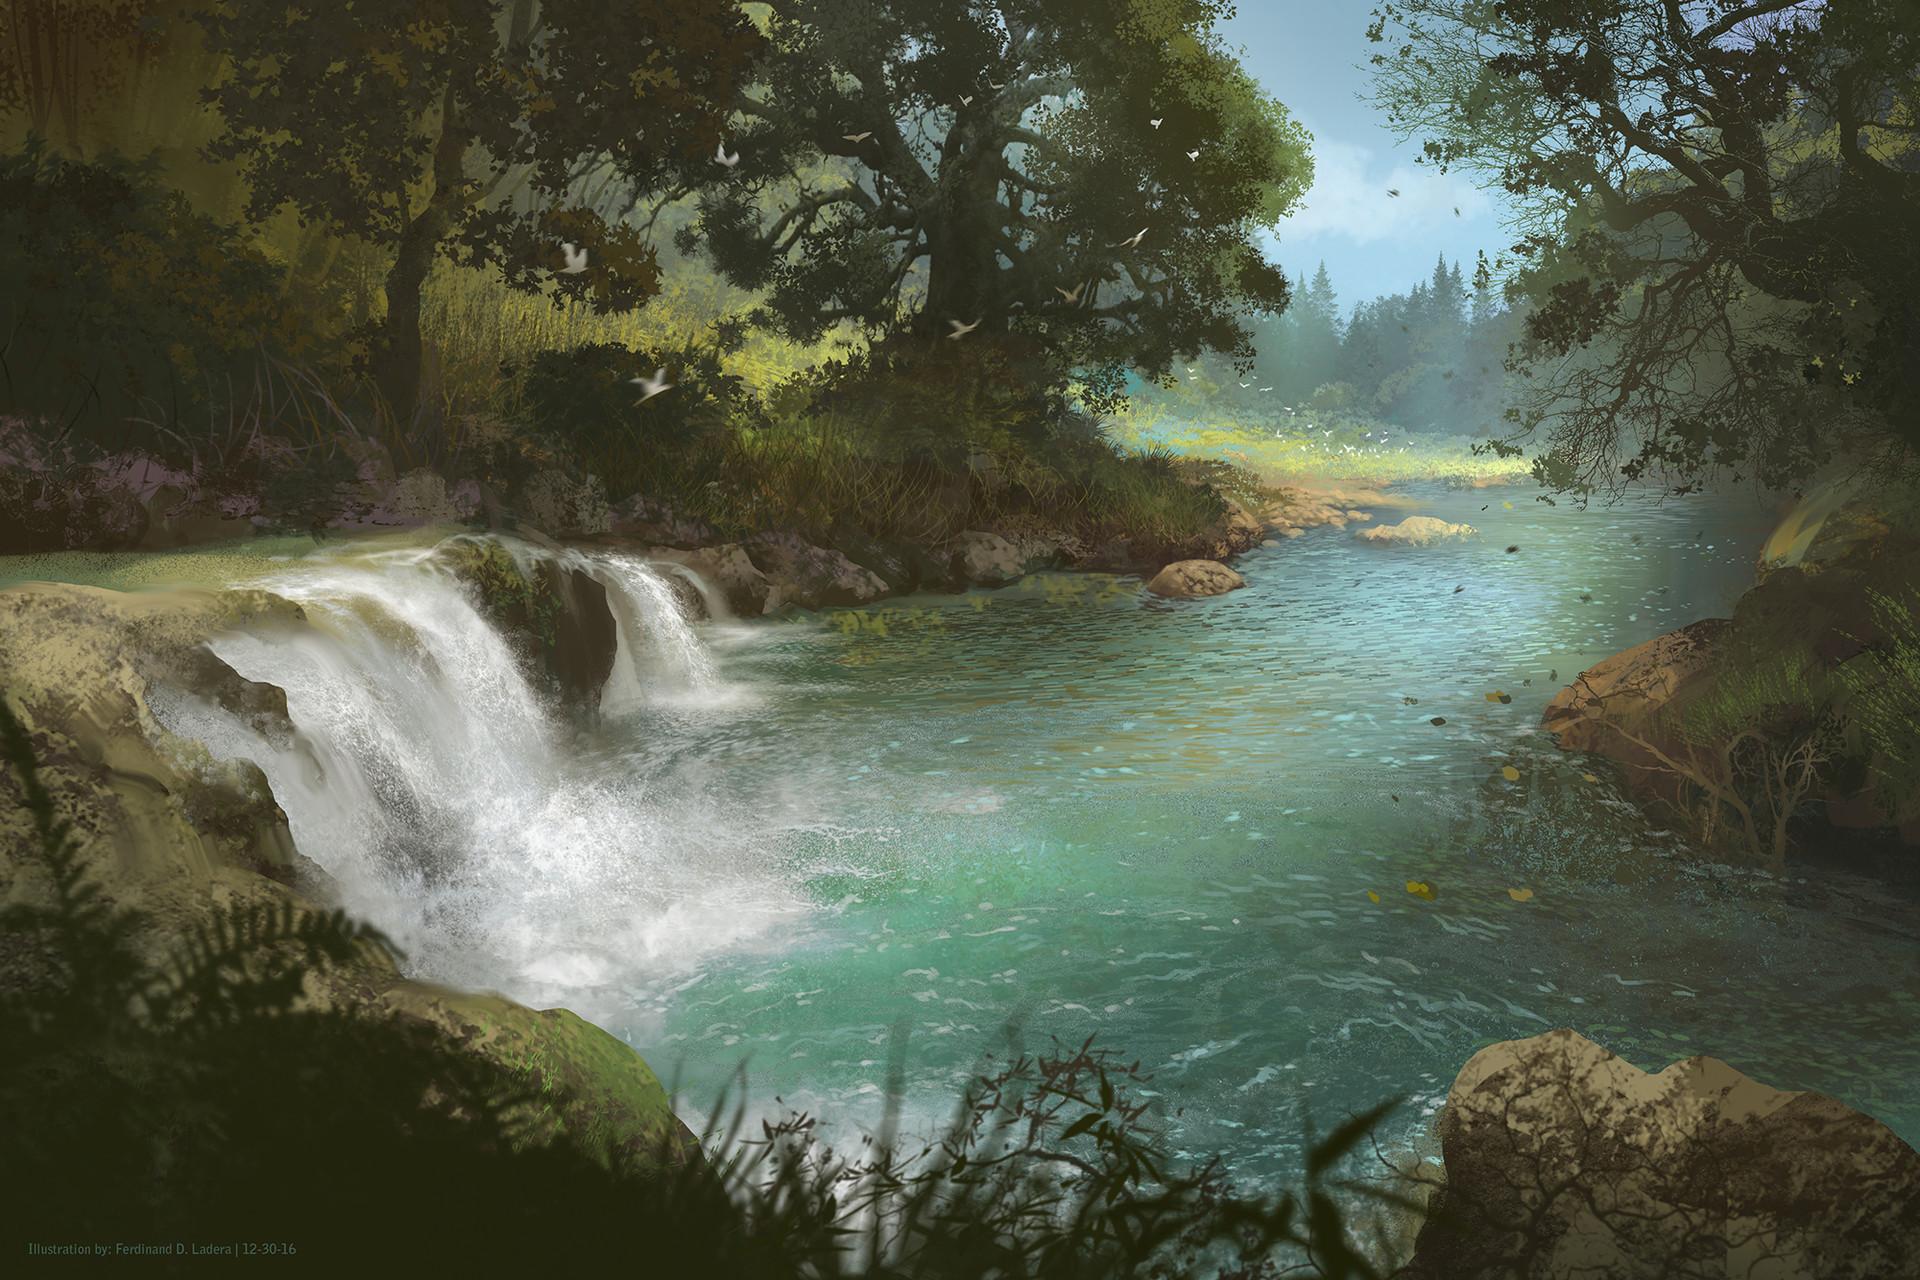 Ferdinand ladera stream2k